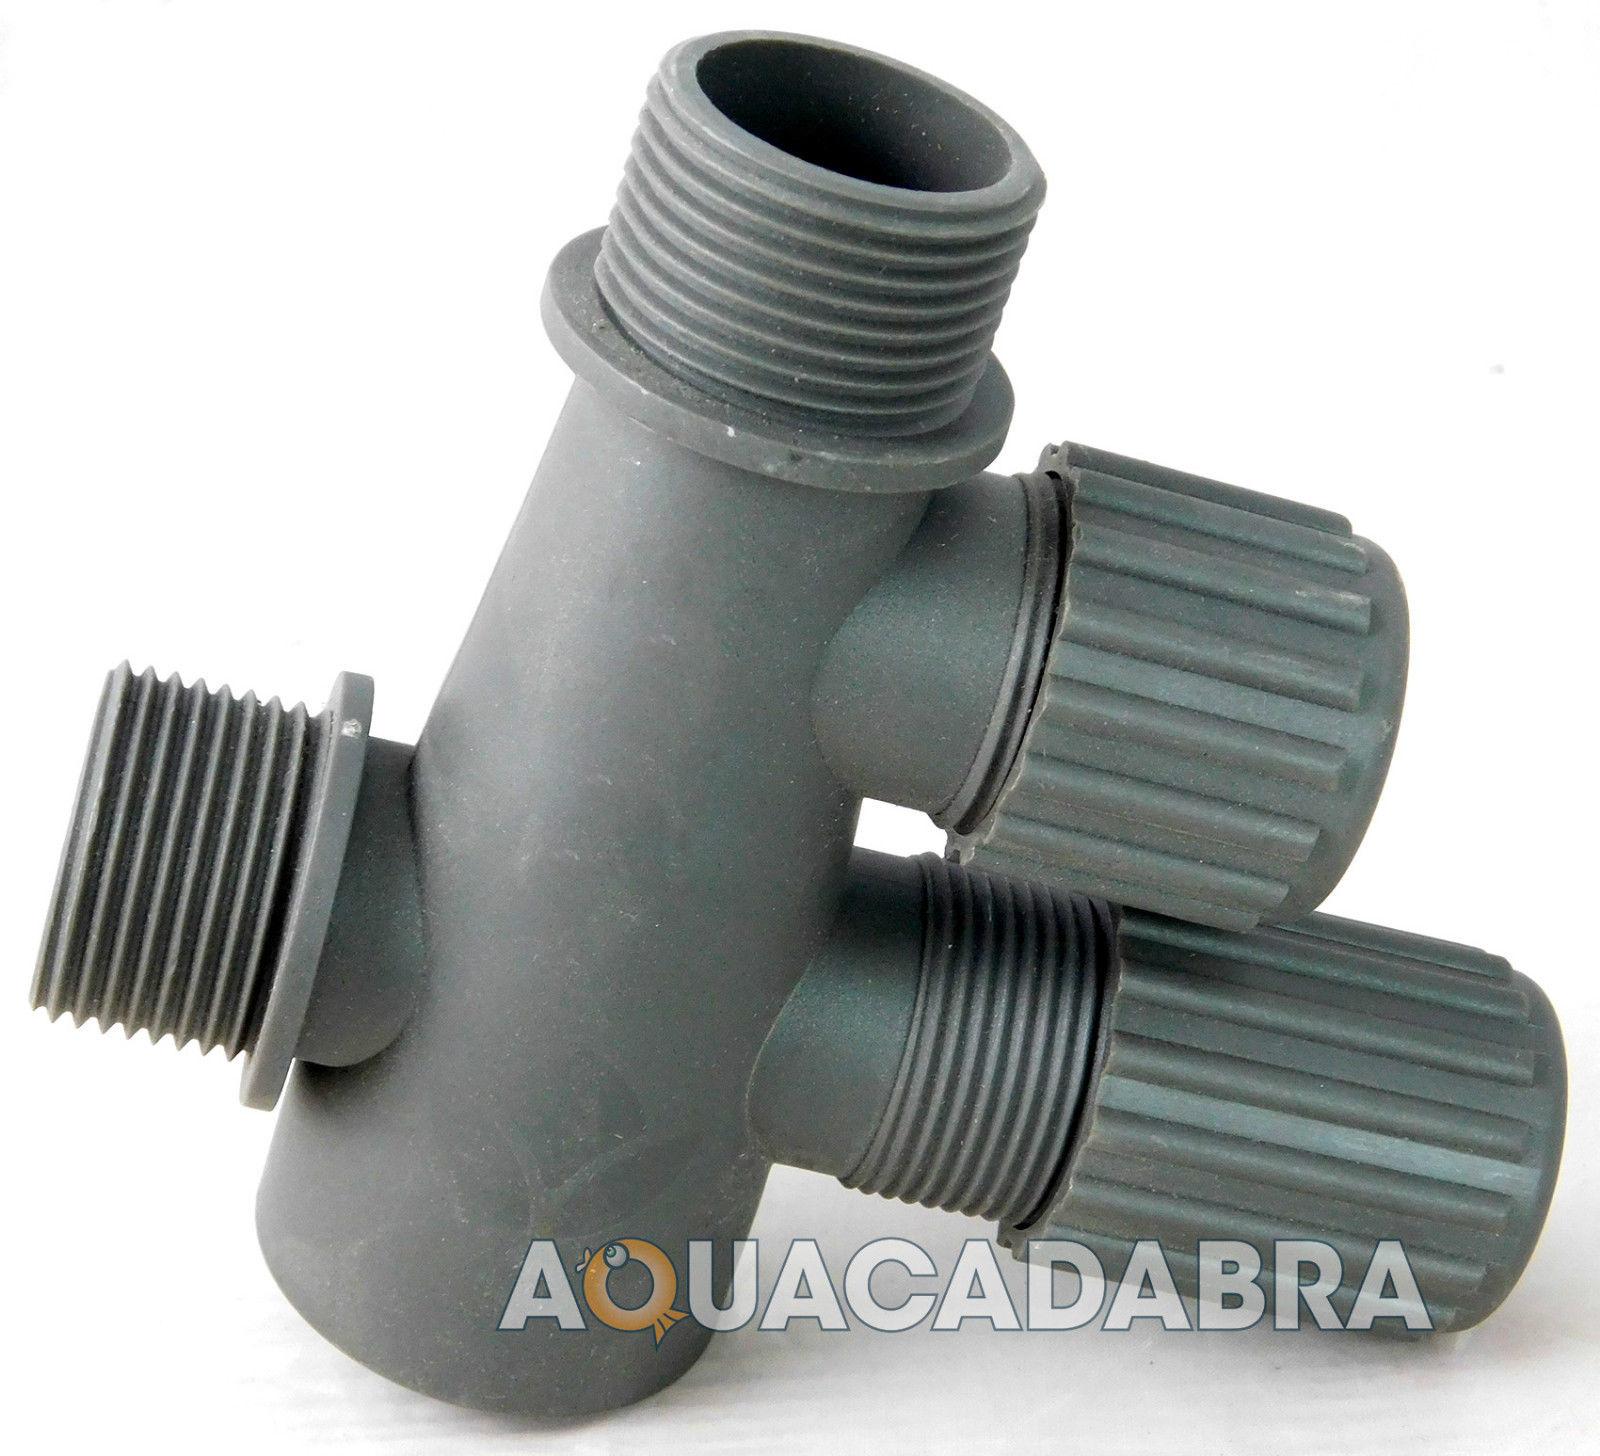 Lotus adjustable fountain t piece garden koi pond pump for Garden pond hose connectors